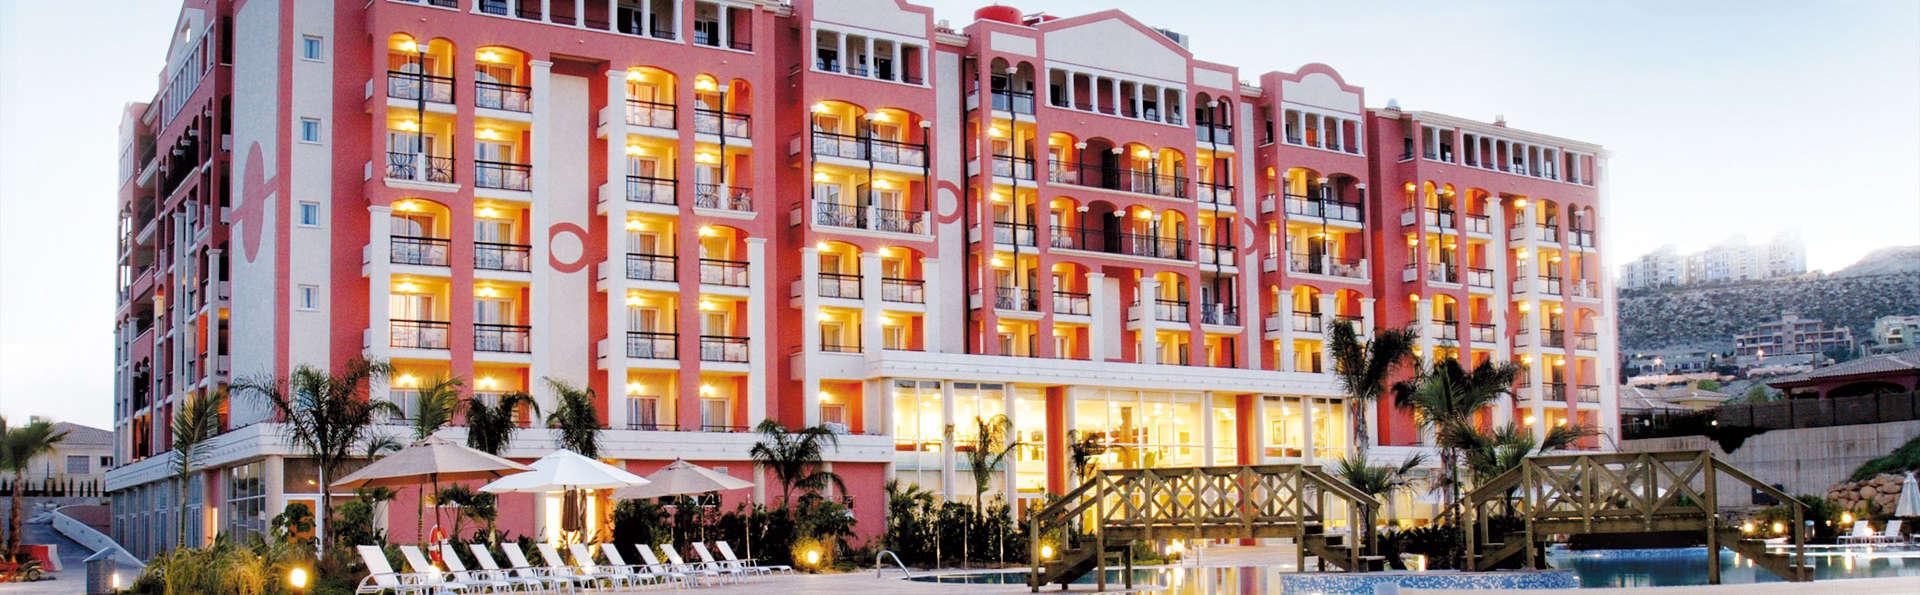 Hotel Bonalba Alicante - edit_front312.jpg